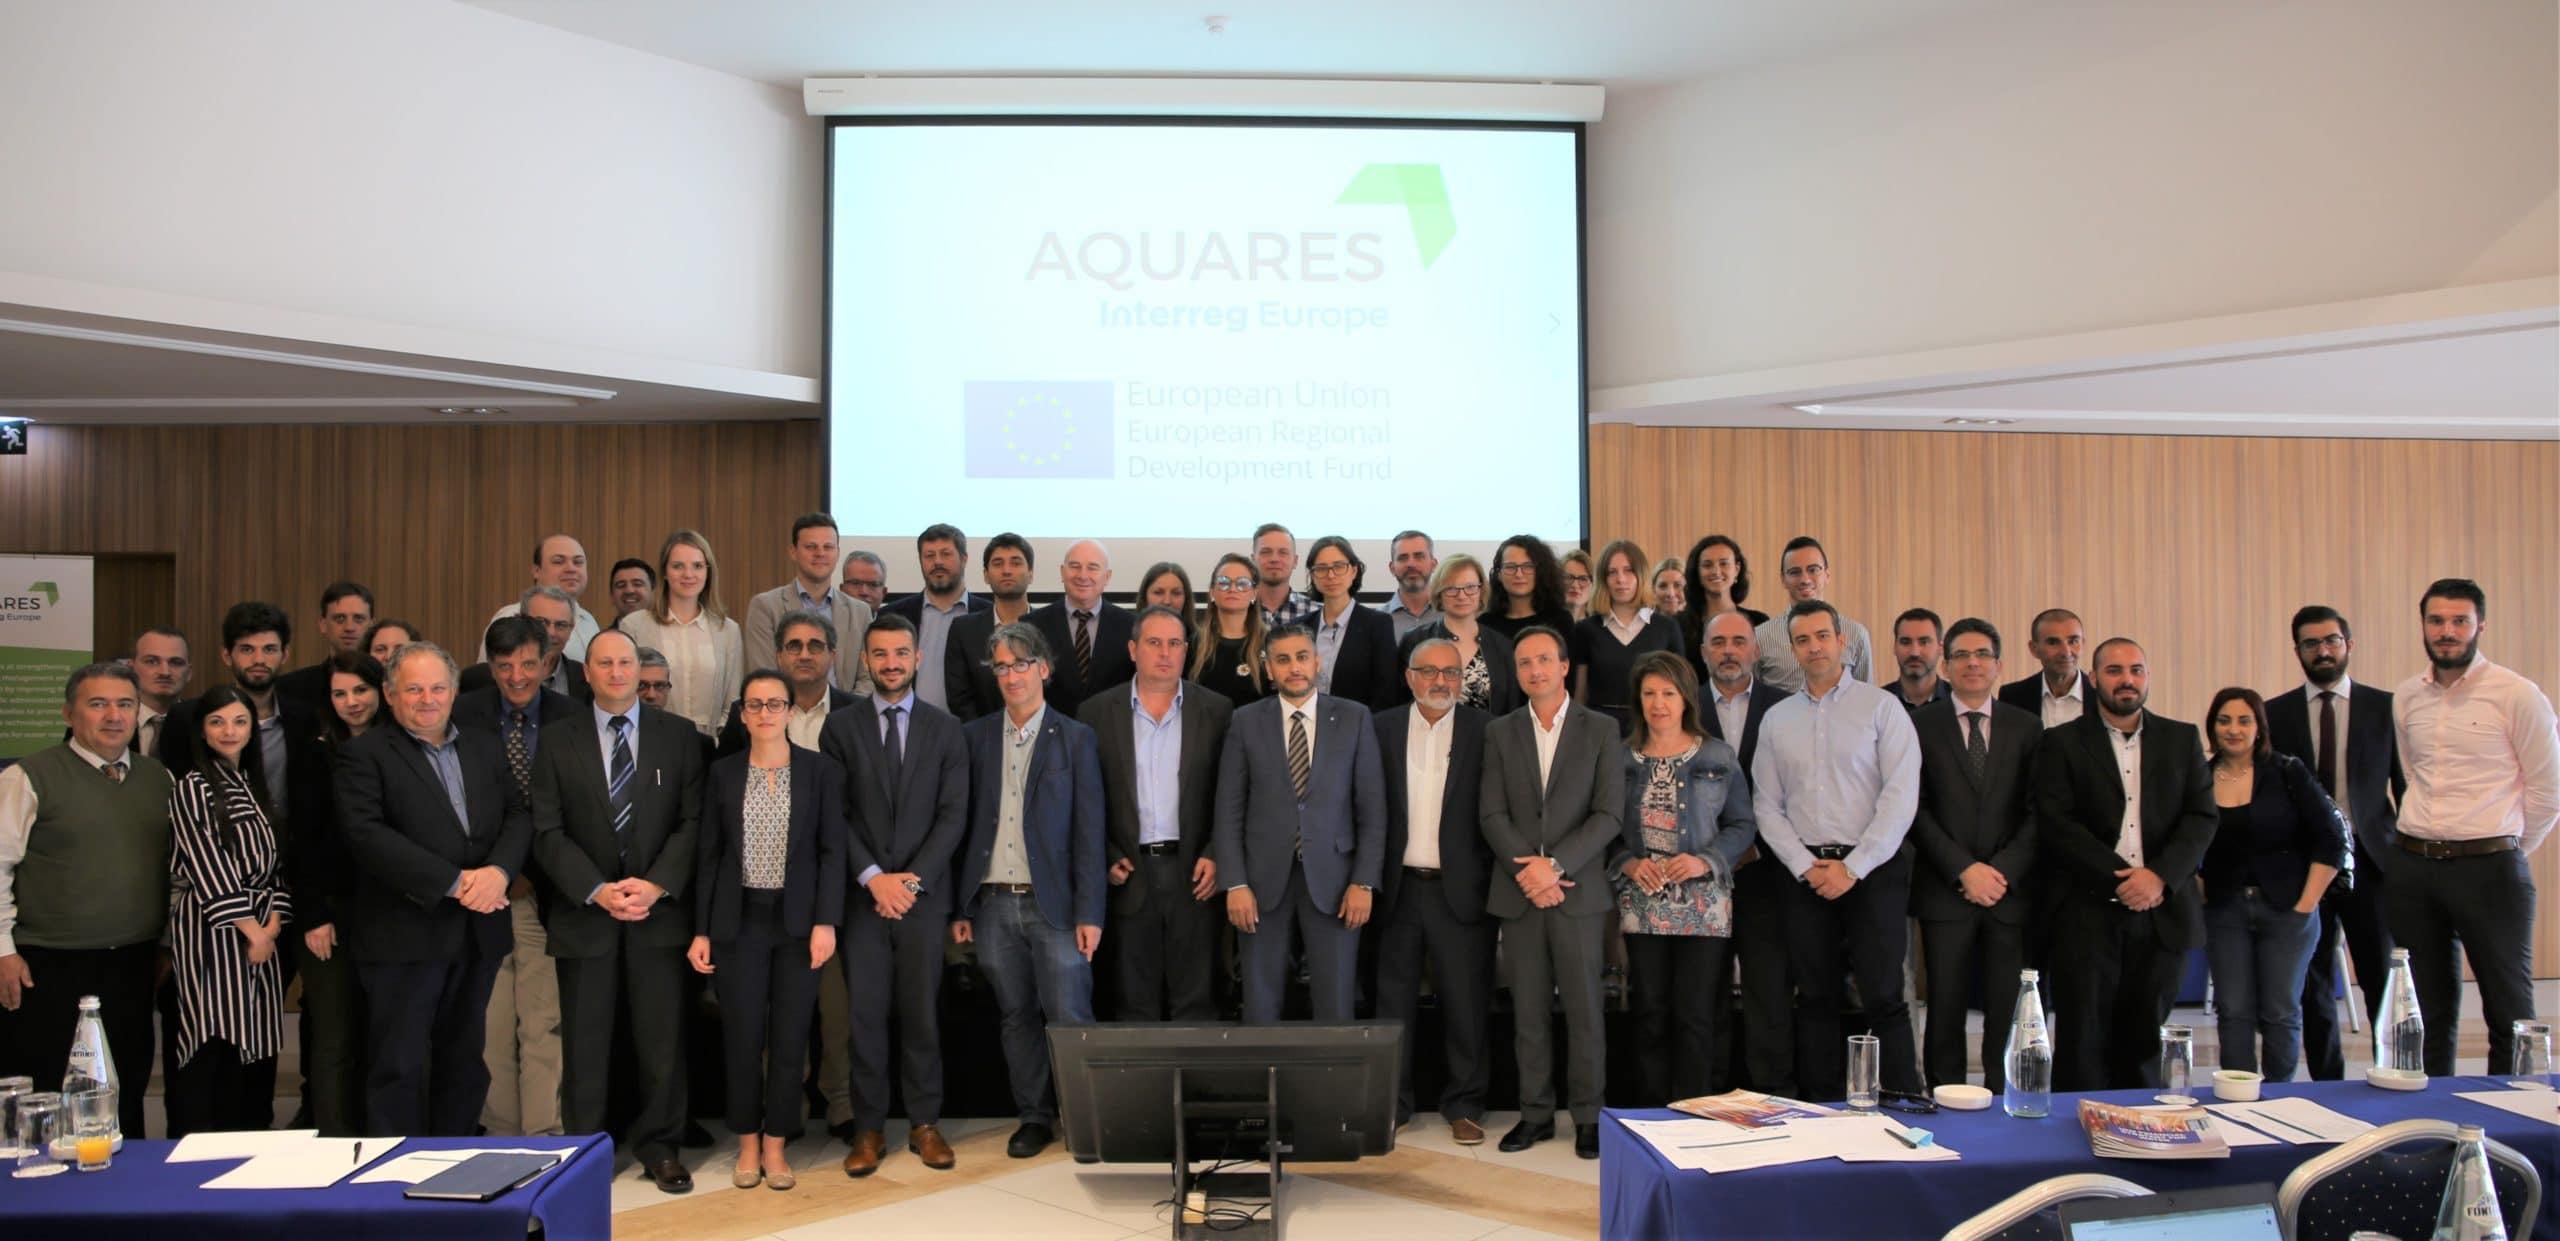 Aquares water reuse meeting